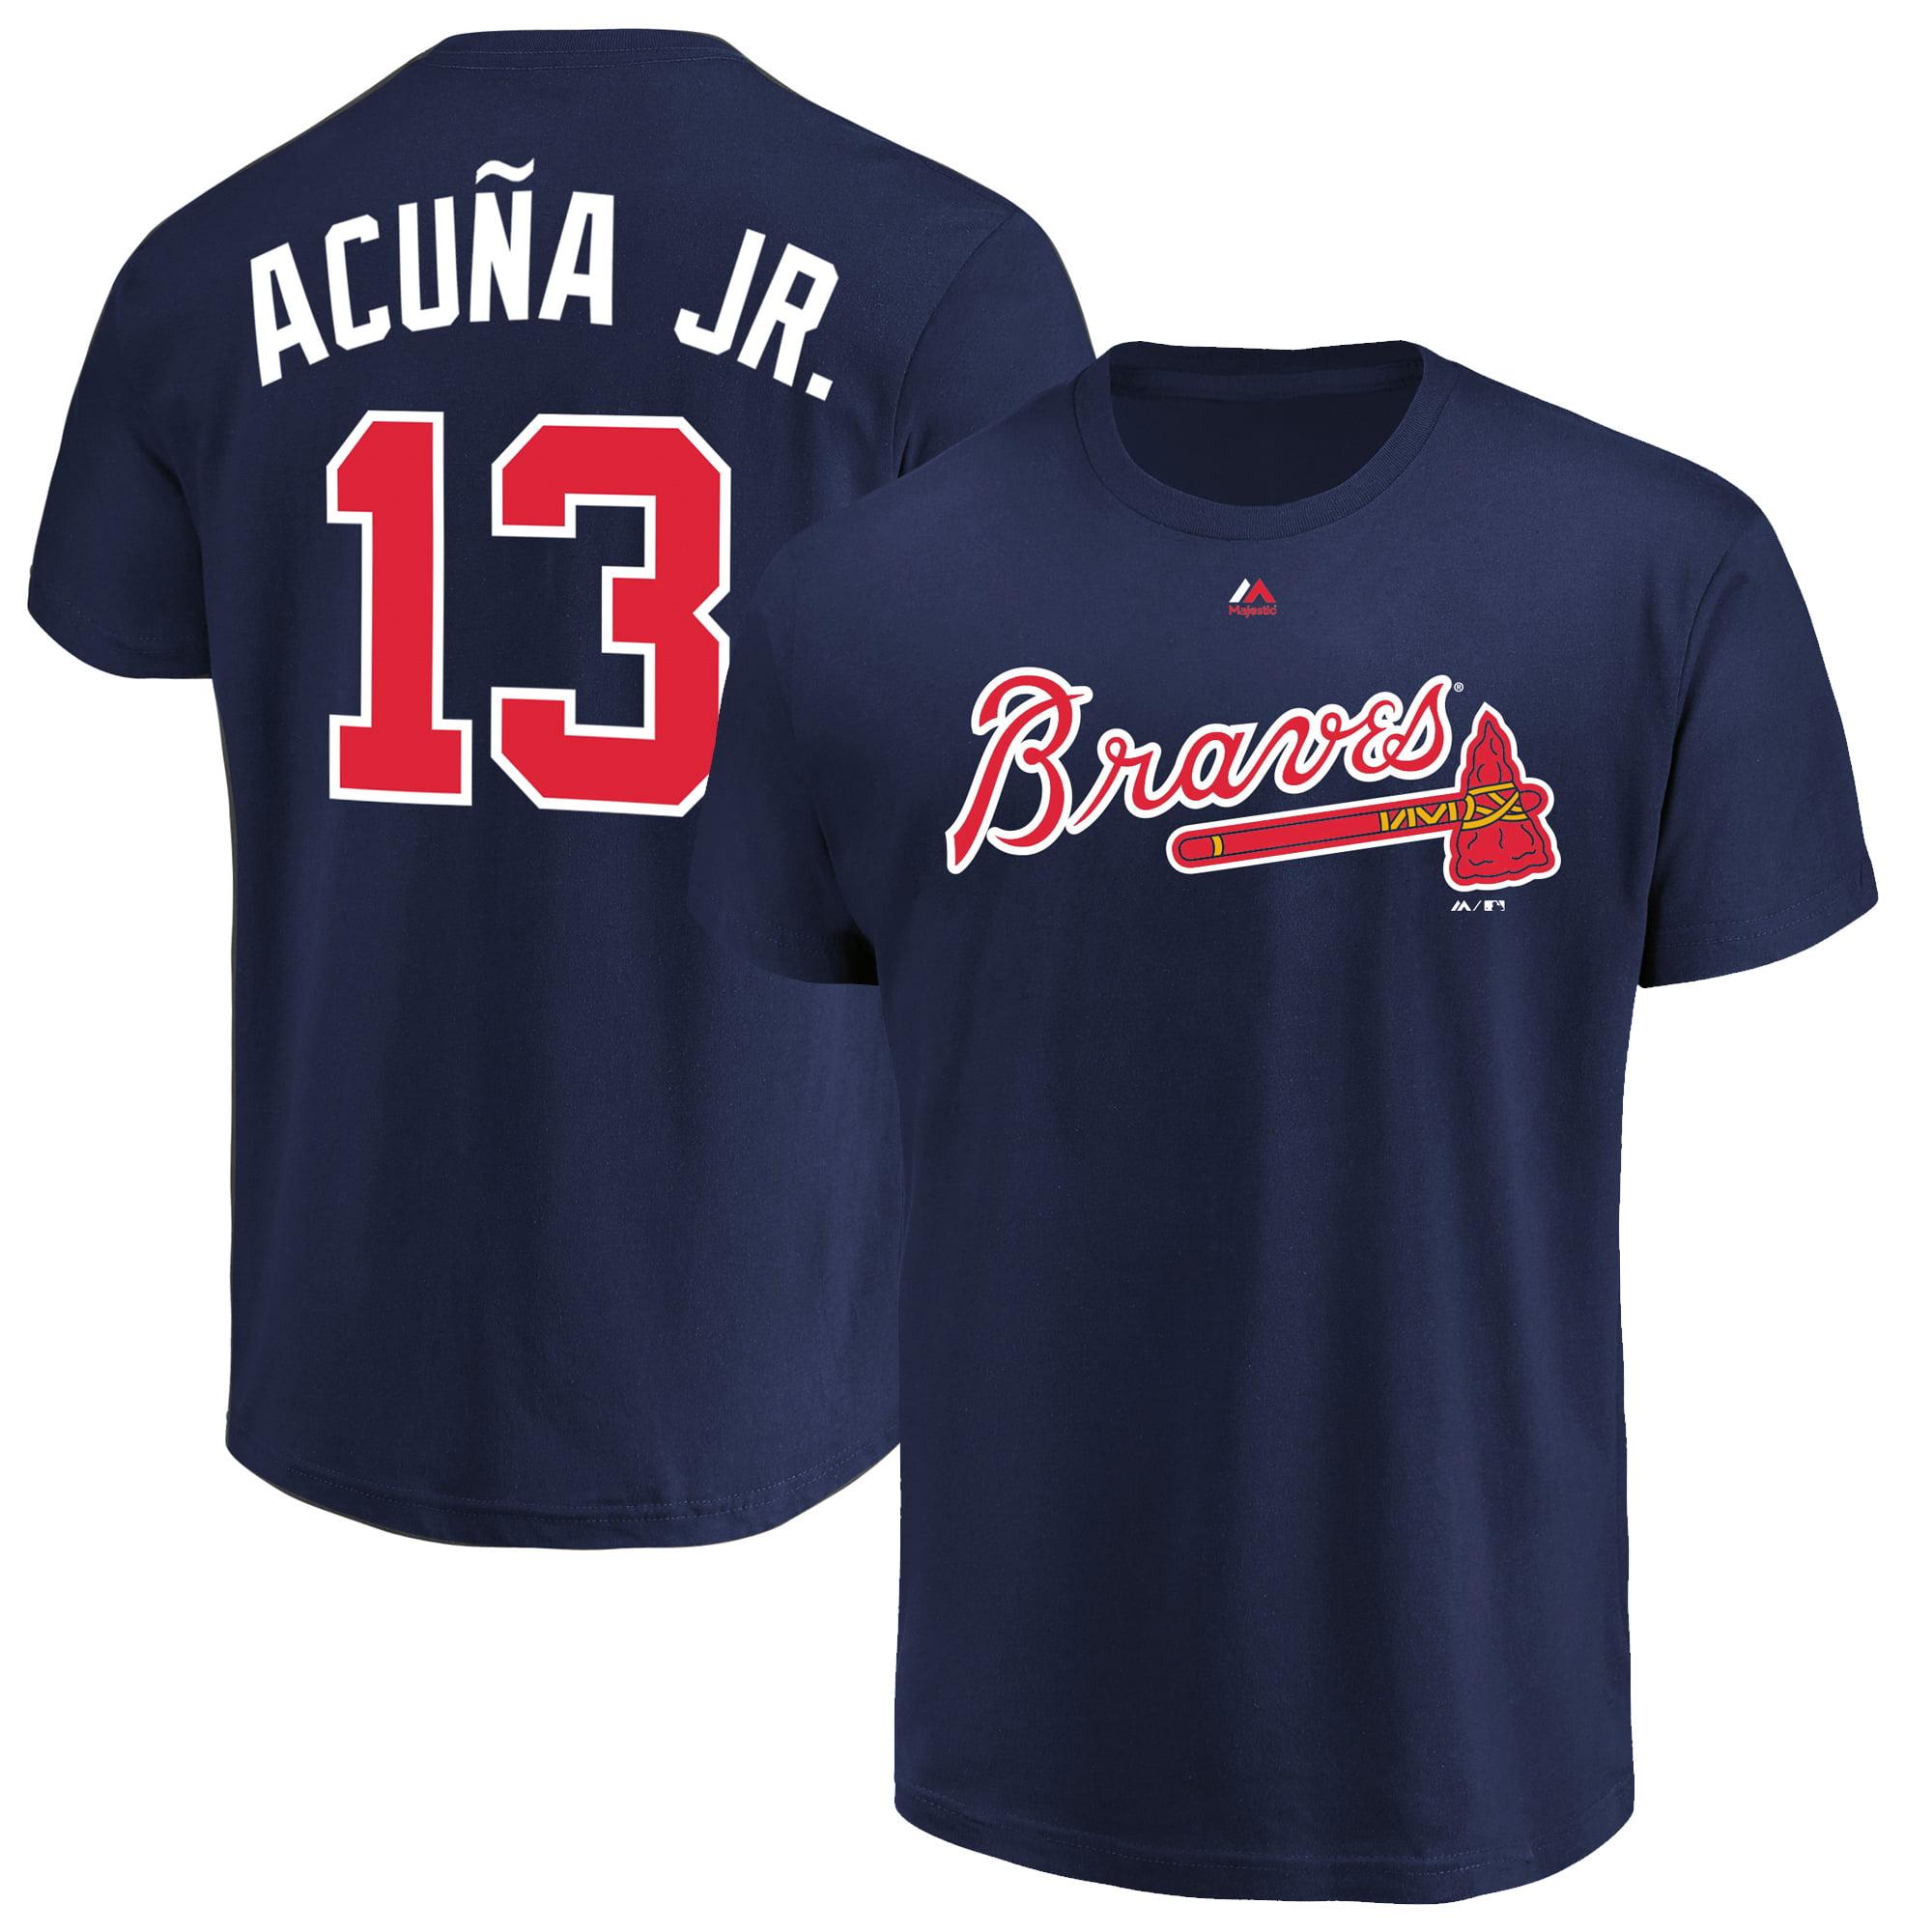 Ronald Acu-a Jr. Atlanta Braves Majestic Big & Tall Player T-Shirt - Navy